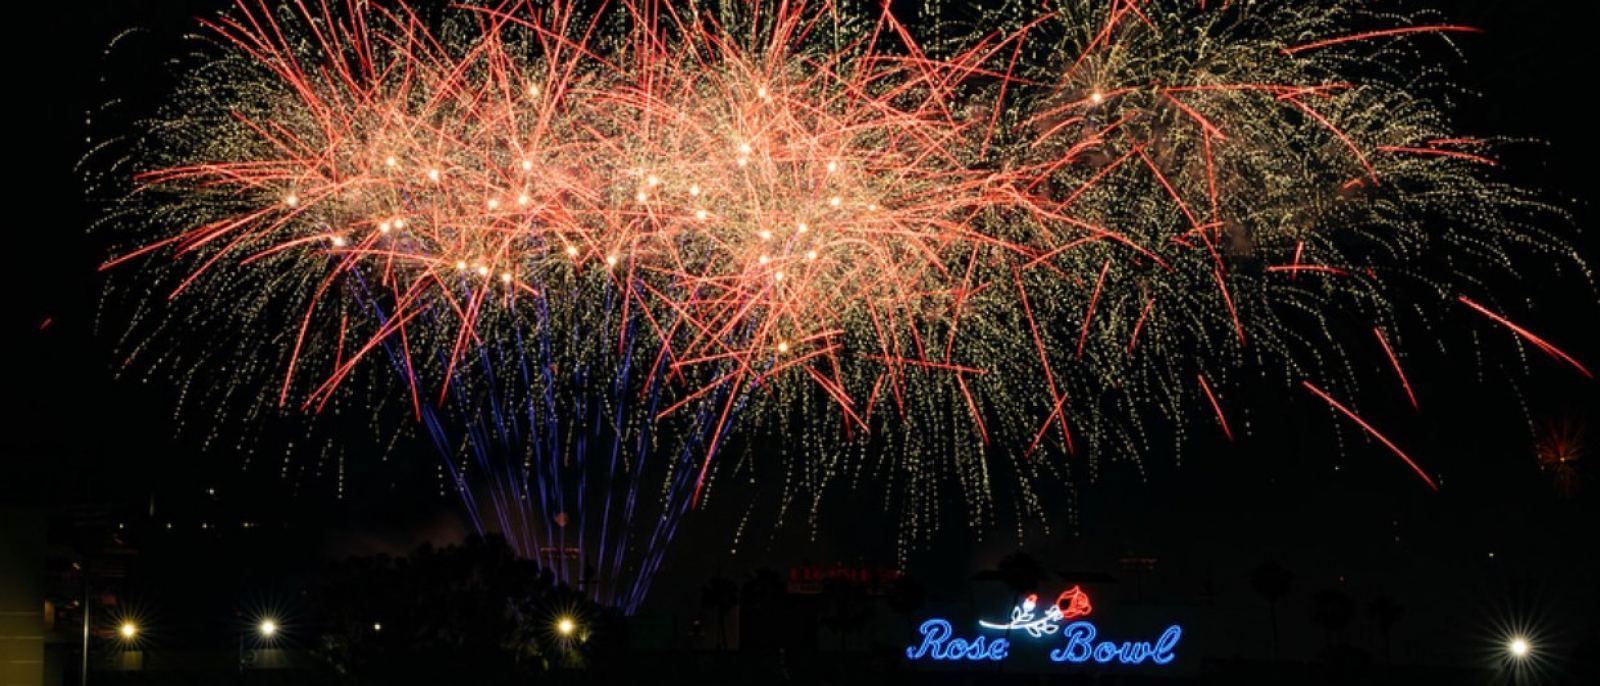 Americafest fireworks at Rose Bowl Stadium